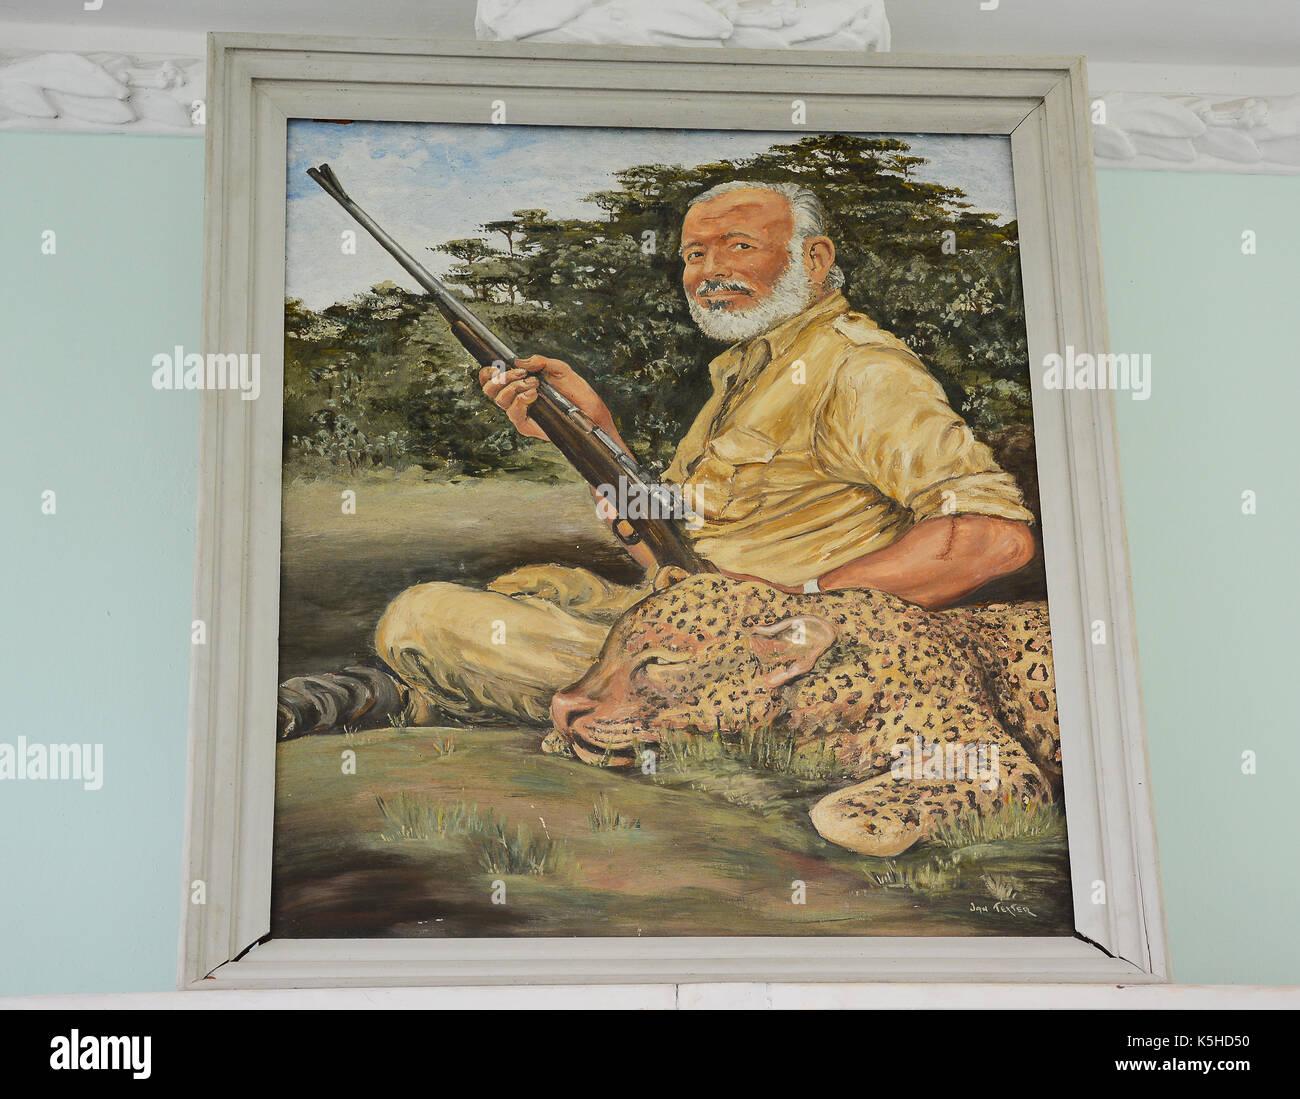 SAN FRANCISCO DE PAULA, CUBA - JULY 23, 2016: Ernest Hemingway portrait at Finca Vigia. Hemingway lived in the house Stock Photo